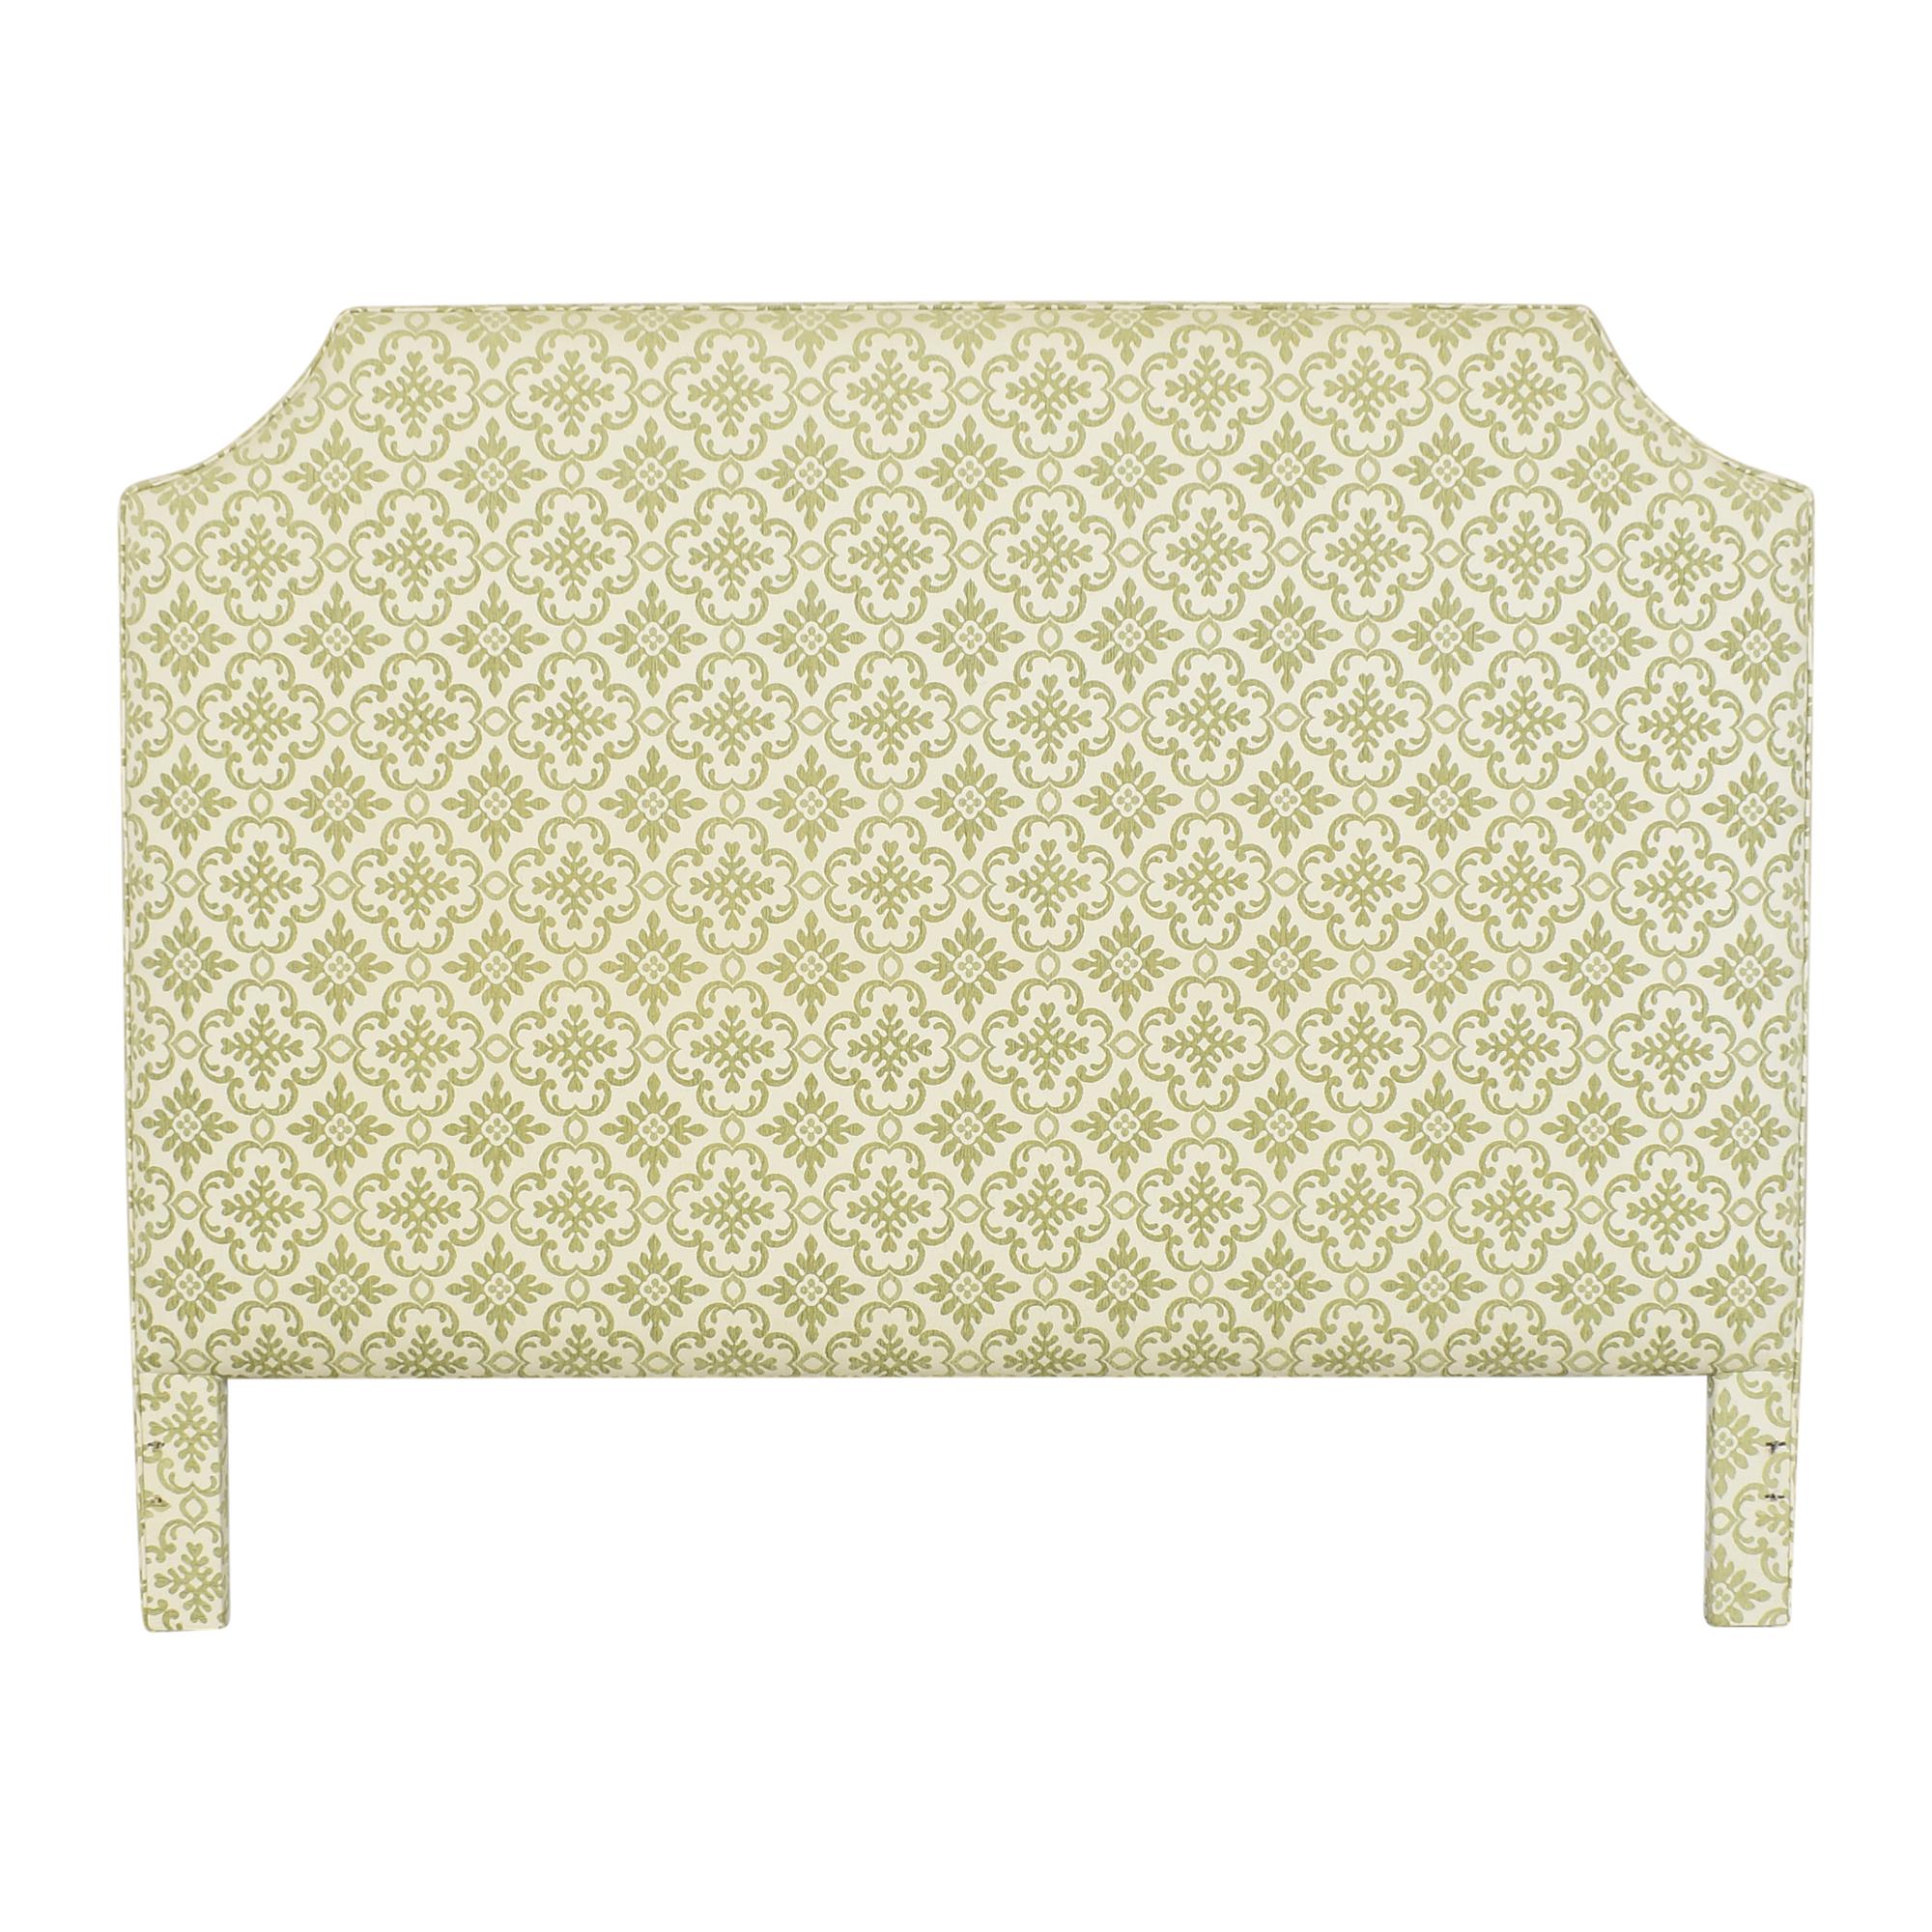 Upholstered King Headboard sale